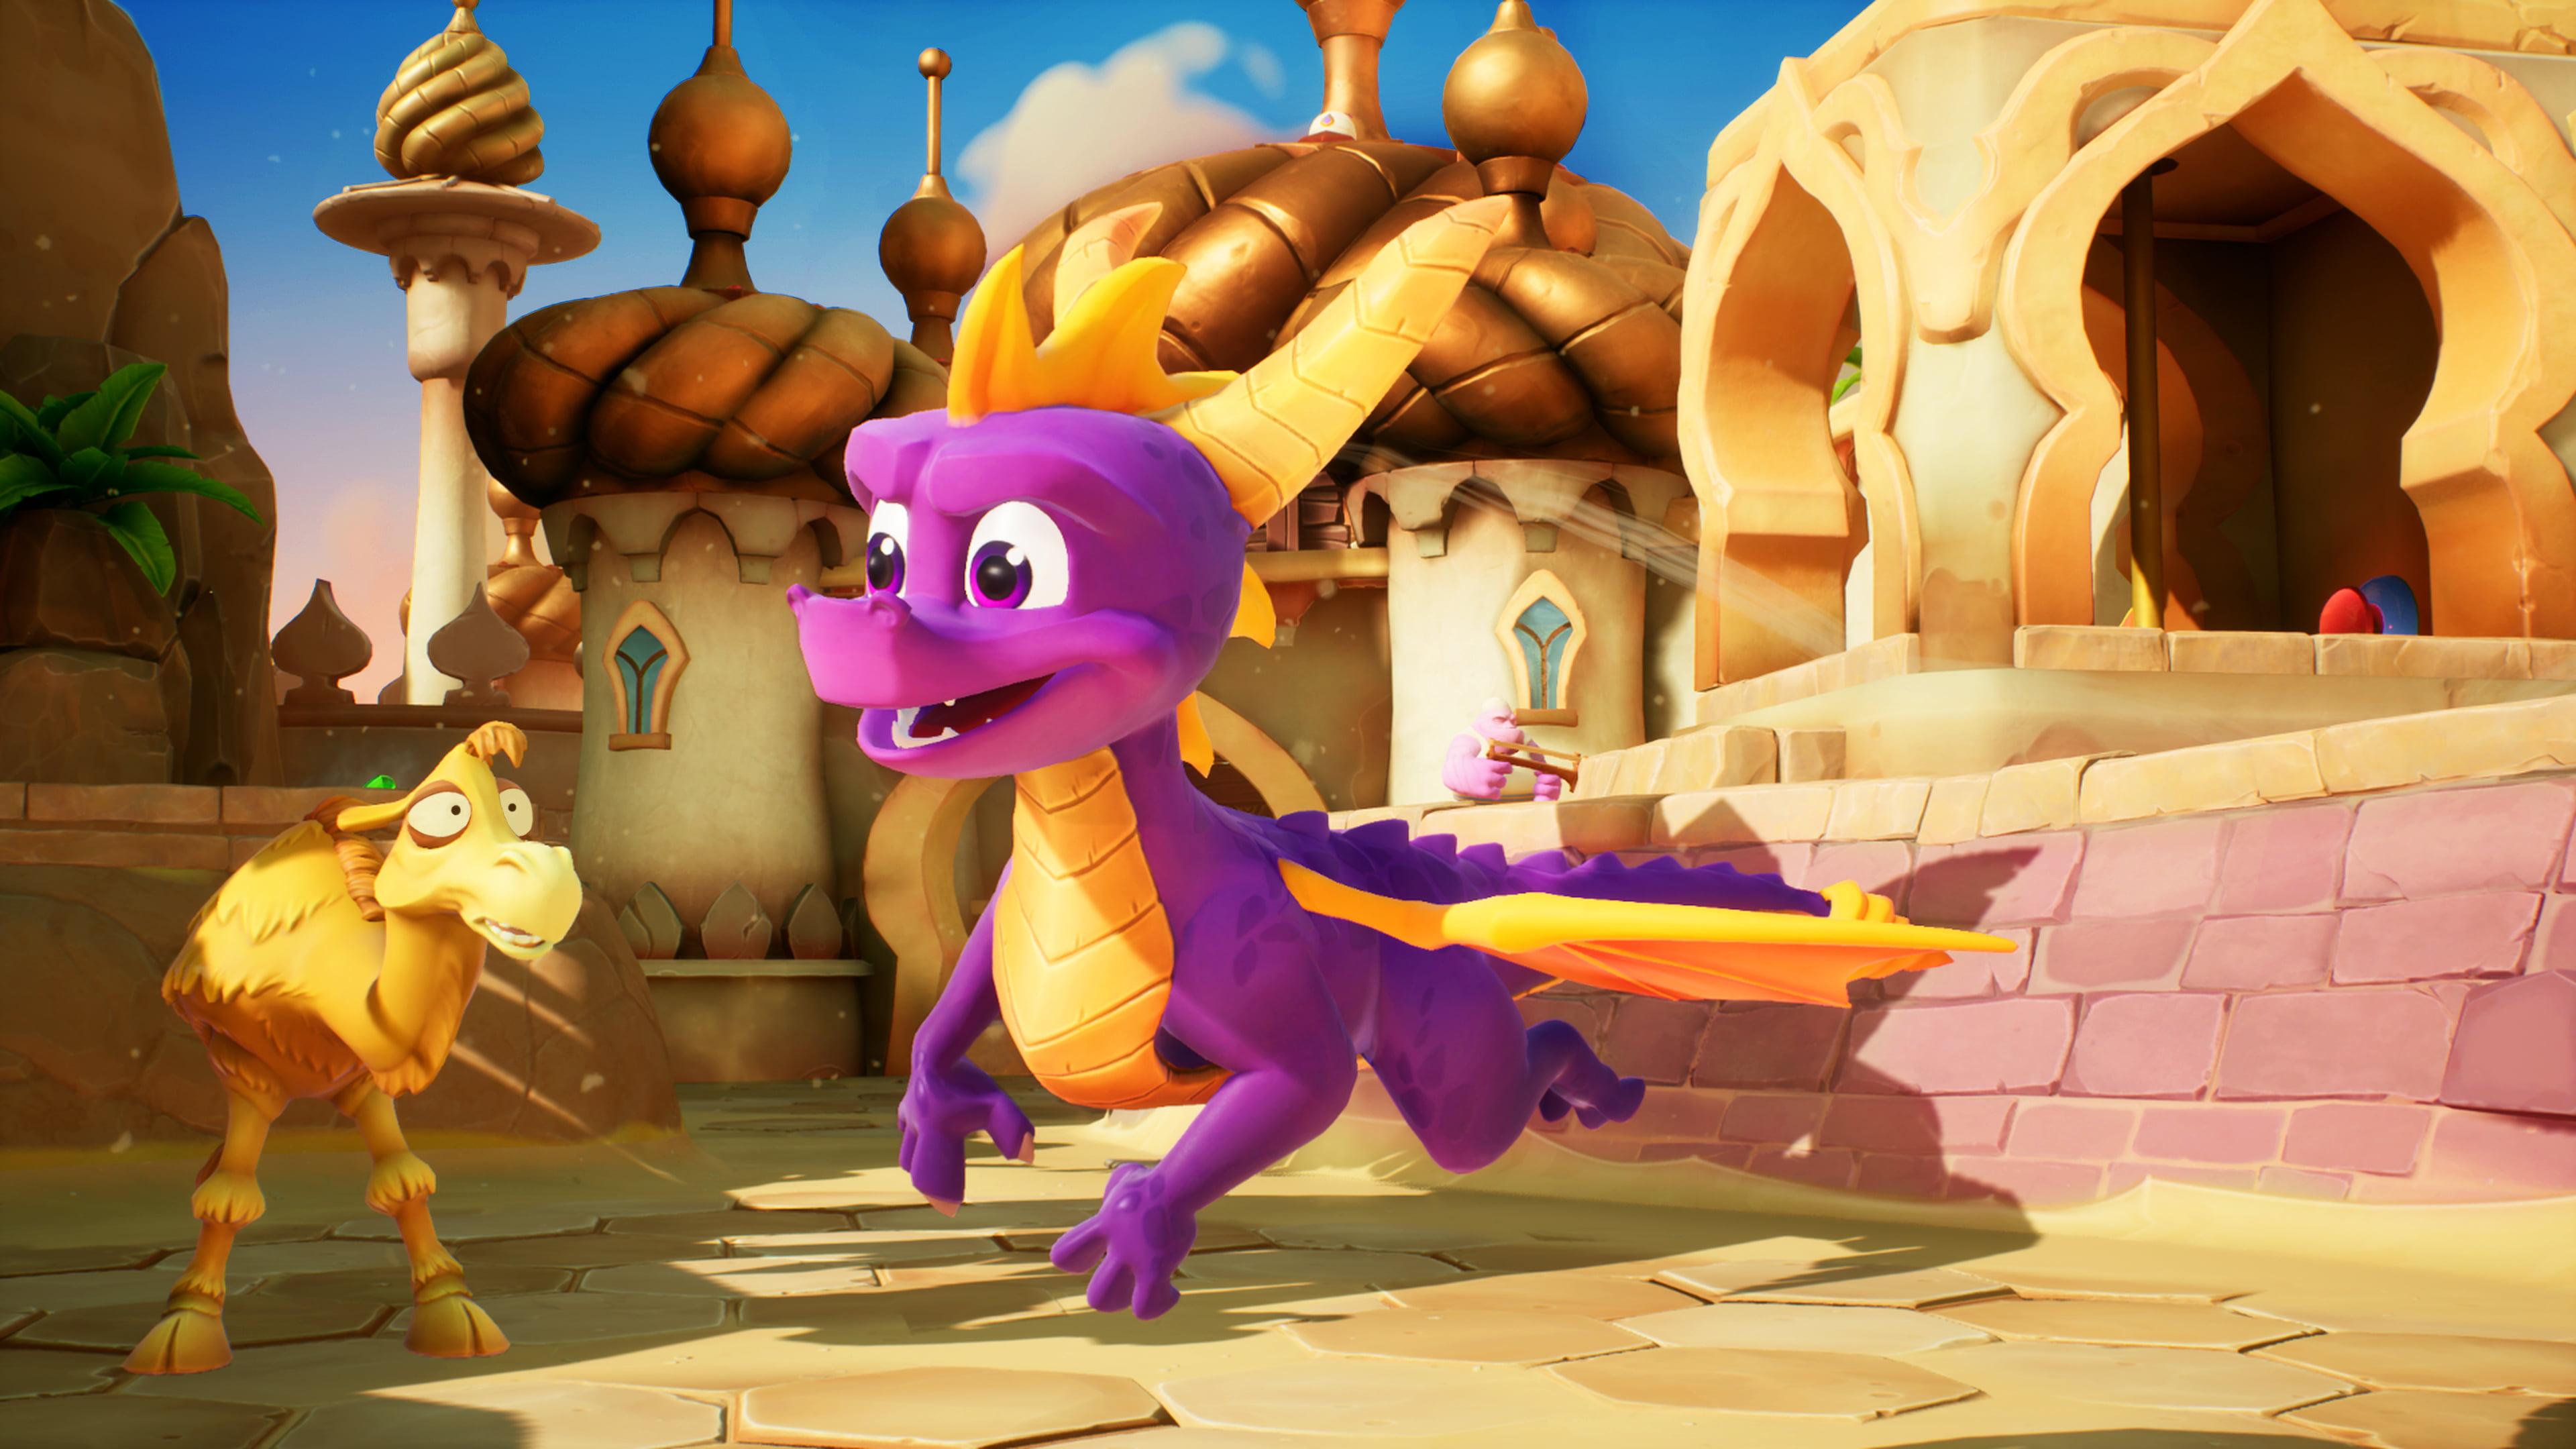 Spyro Reignited Trilogy Activision Xbox One 047875882423 Walmart Com Walmart Com